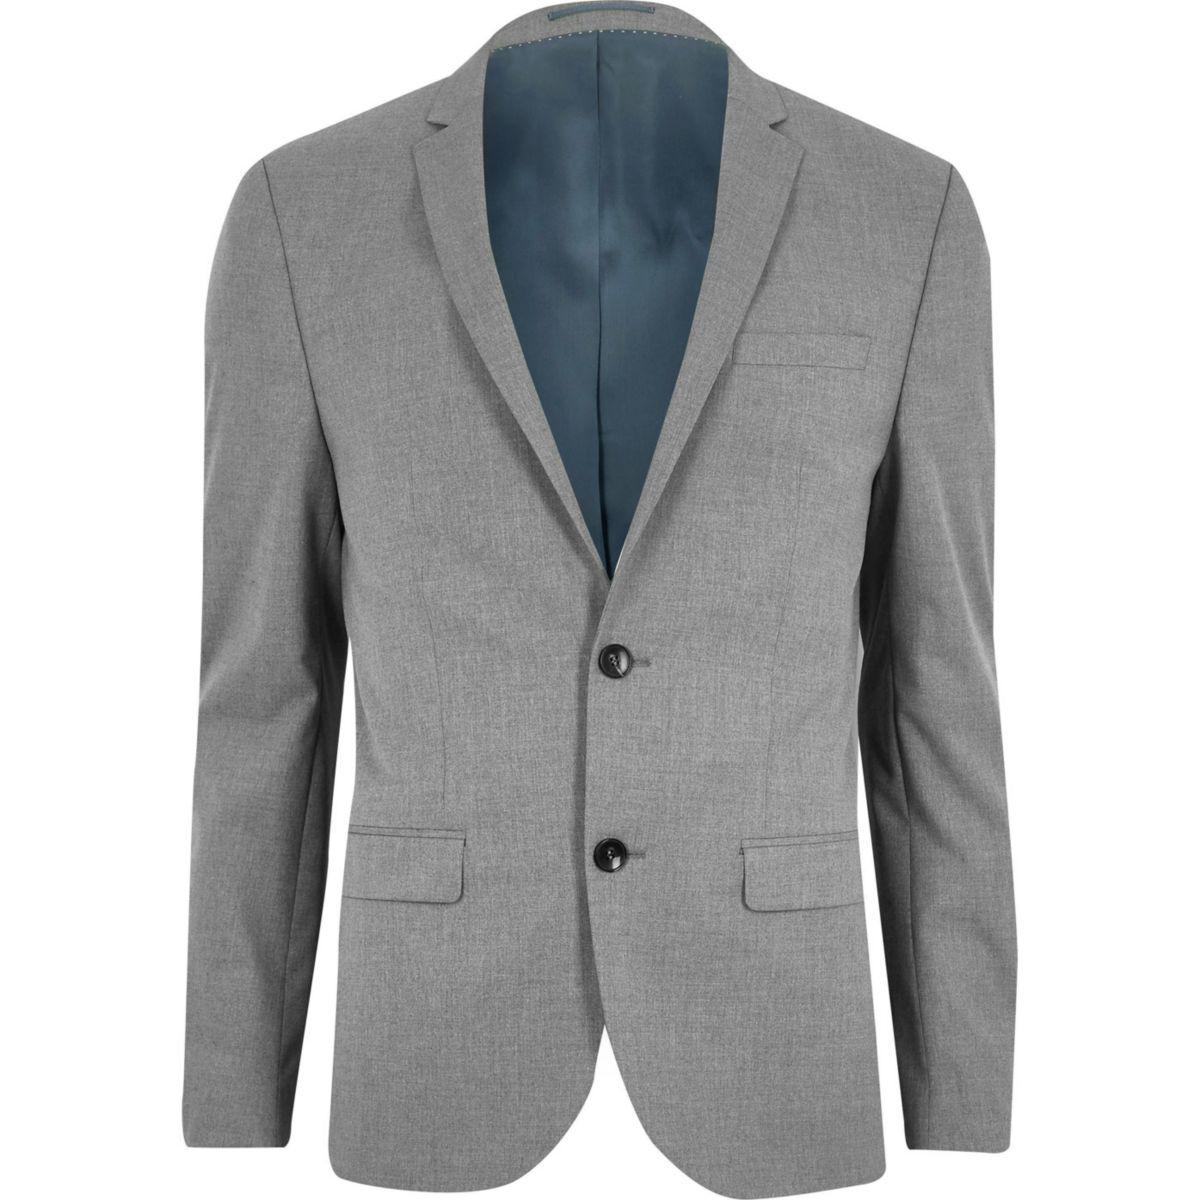 River Island Grey Suit For Men